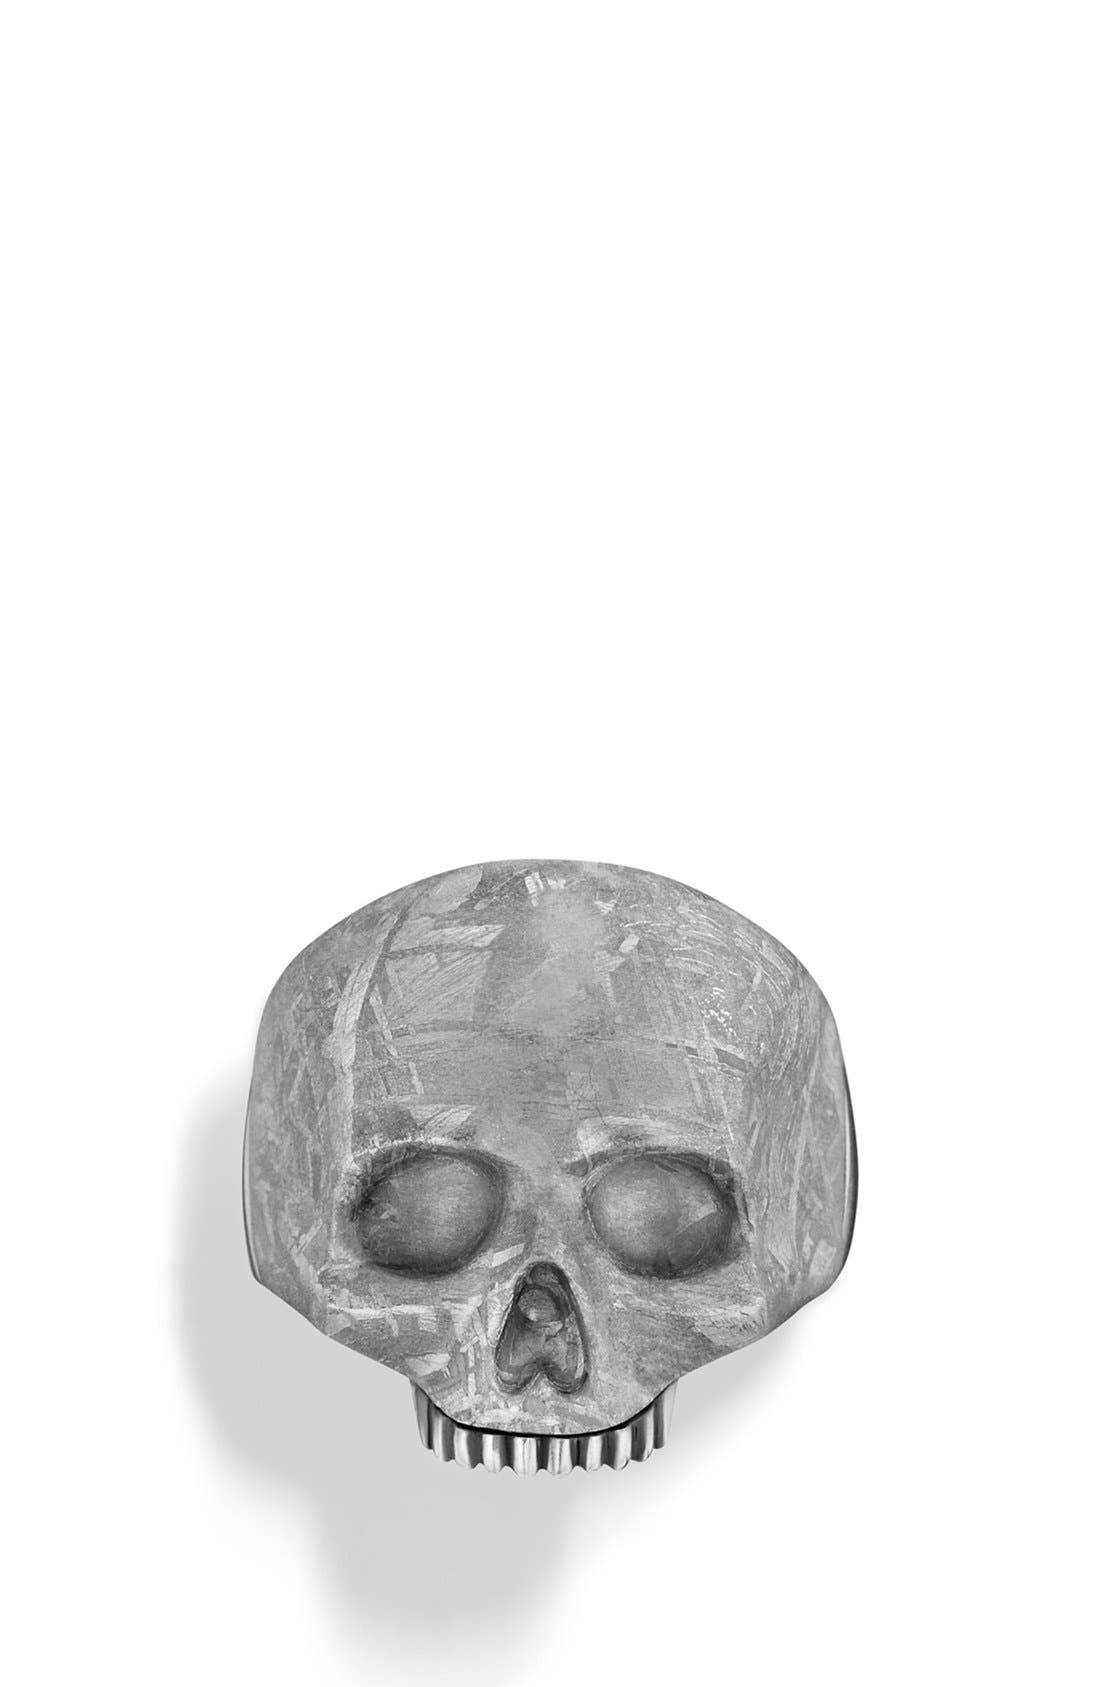 Alternate Image 2  - David Yurman 'Skull' Ring with Carved Meteorite